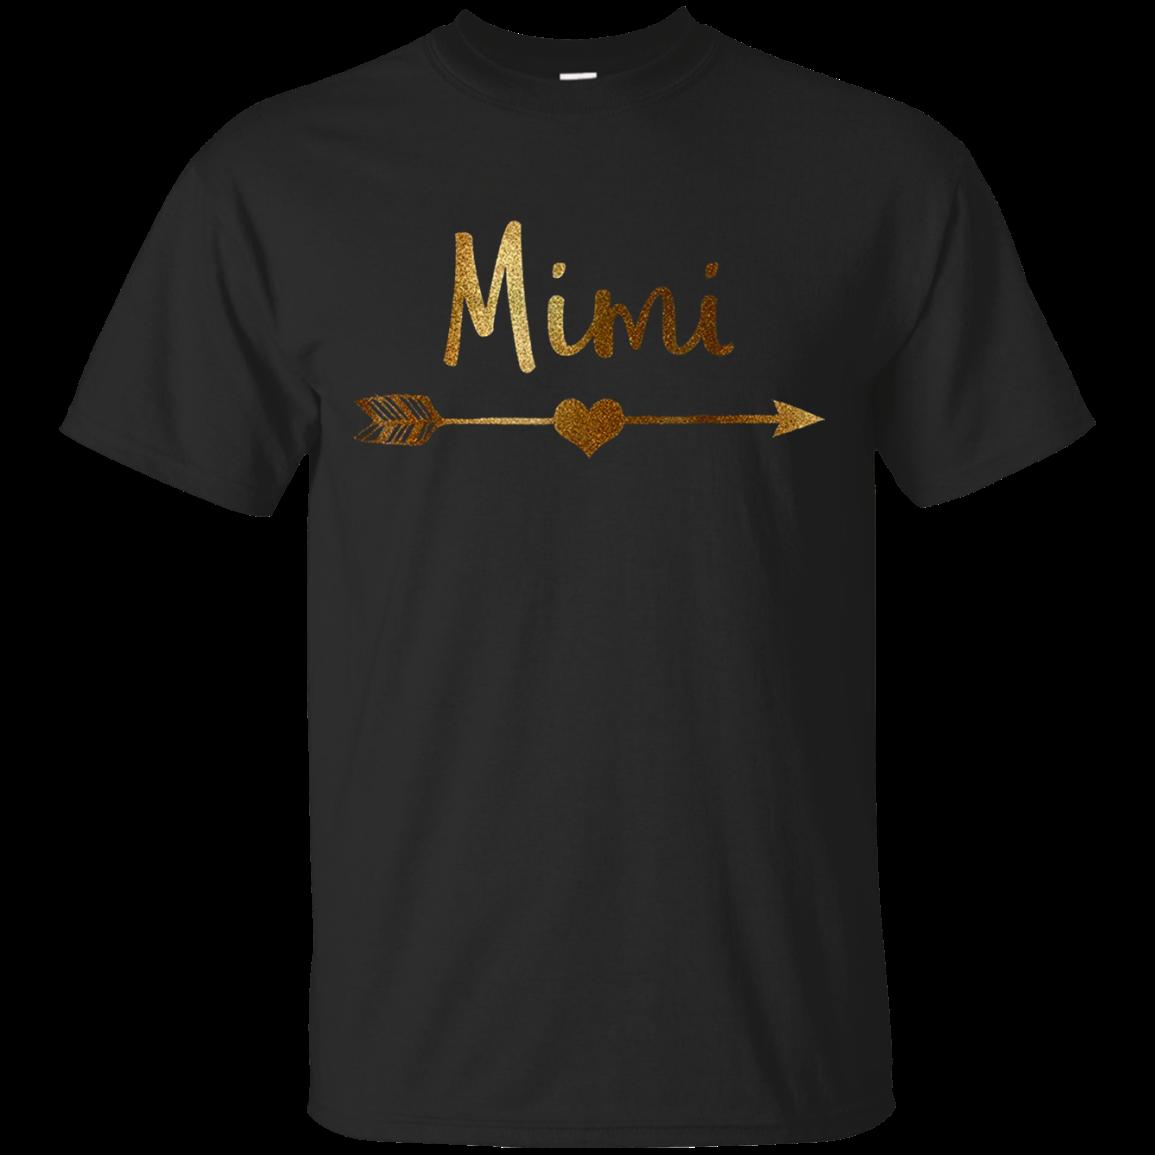 Shop From 1000 Unique Gold Arrow Heart Shirt Mimi T Shirt Sweater